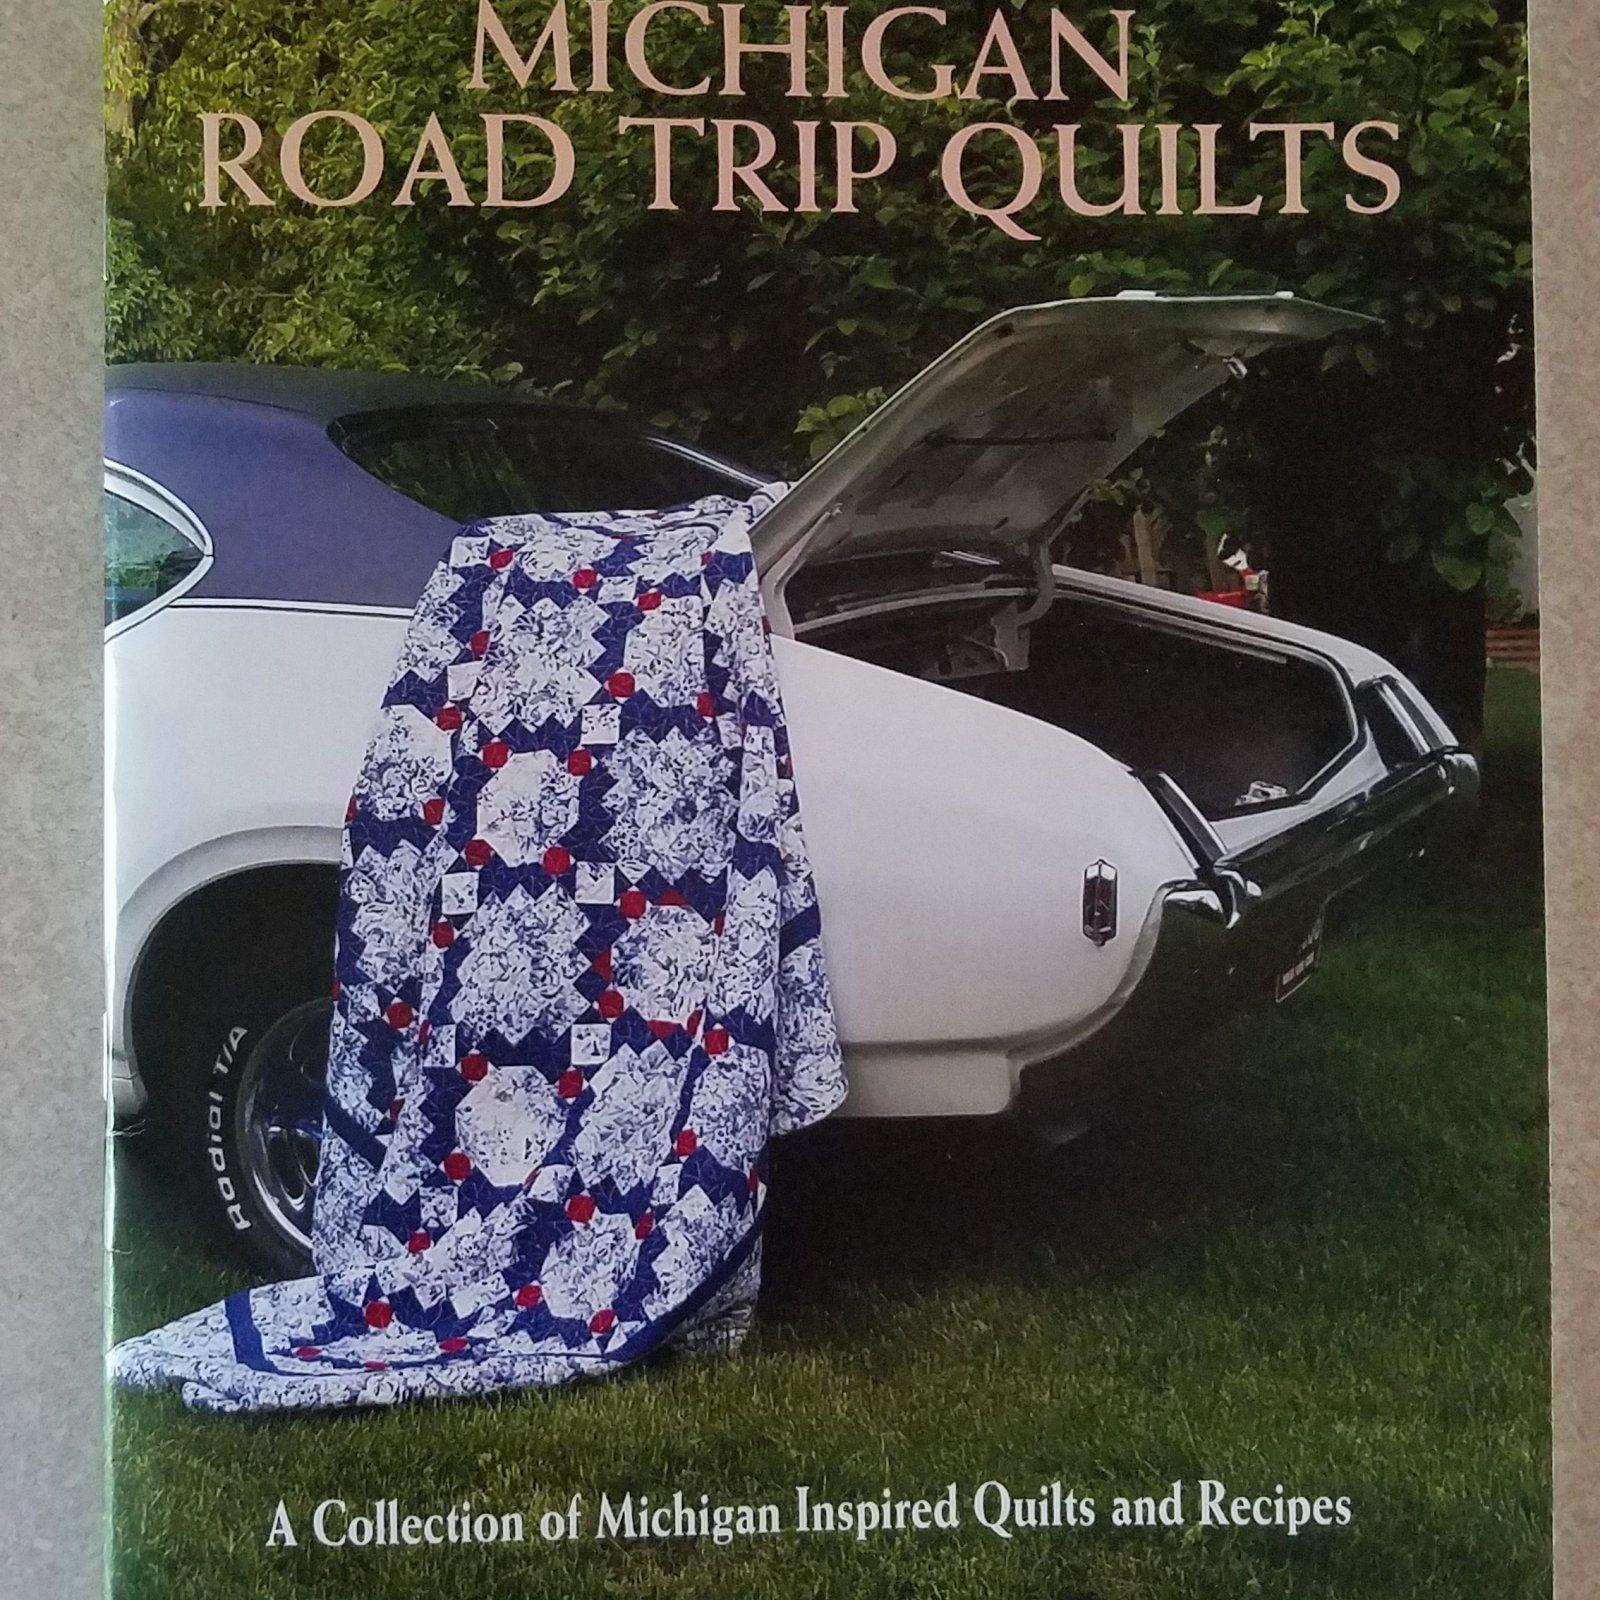 Michigan Road Trip Quilt Book